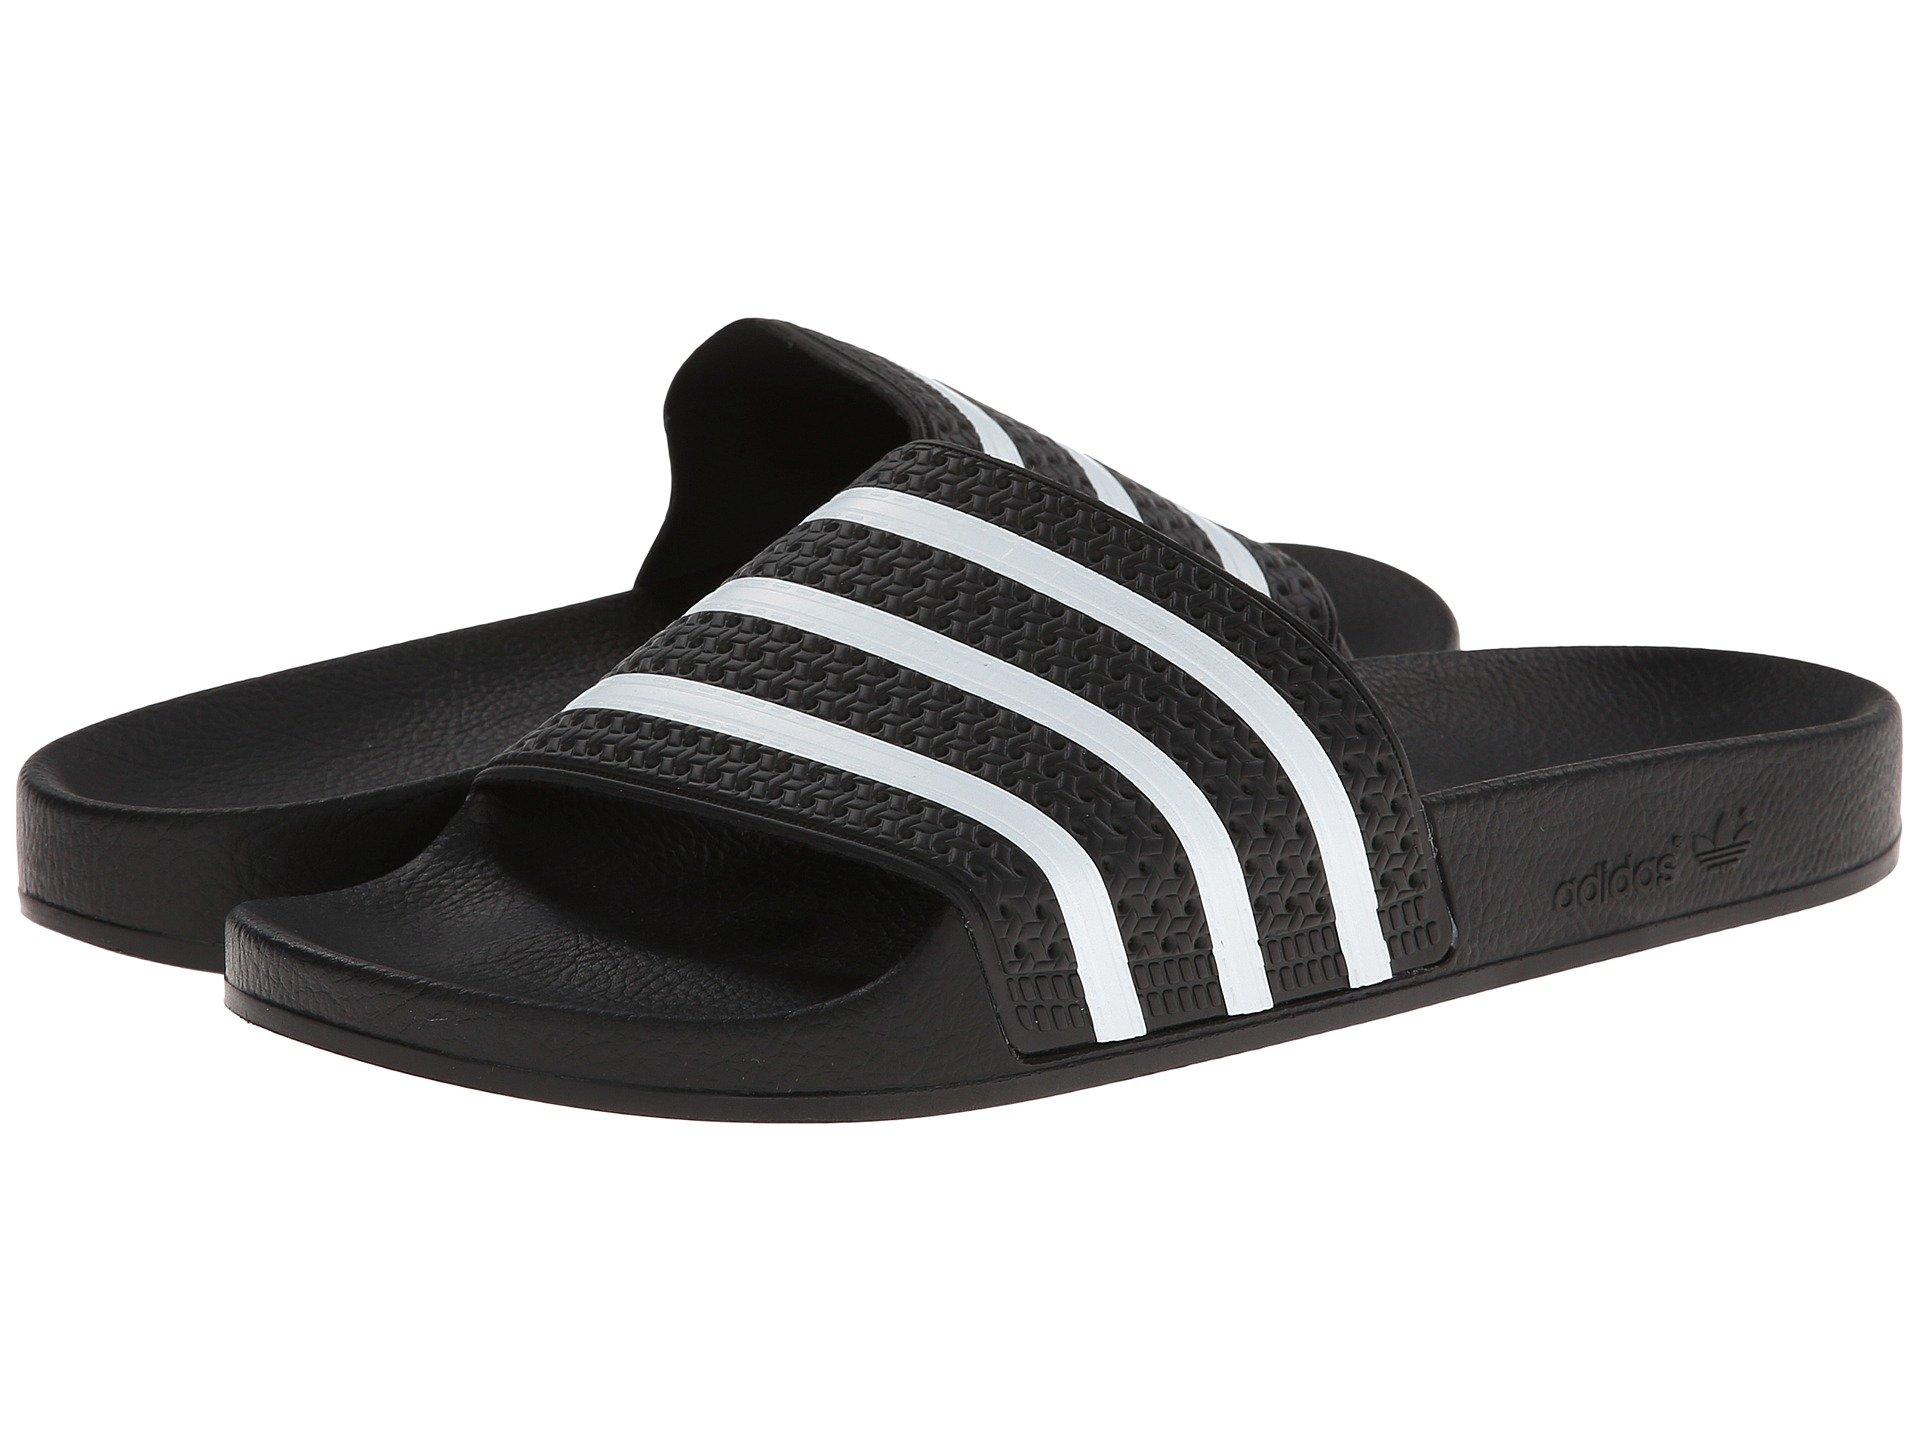 Adidas Adilette At Zappos Com